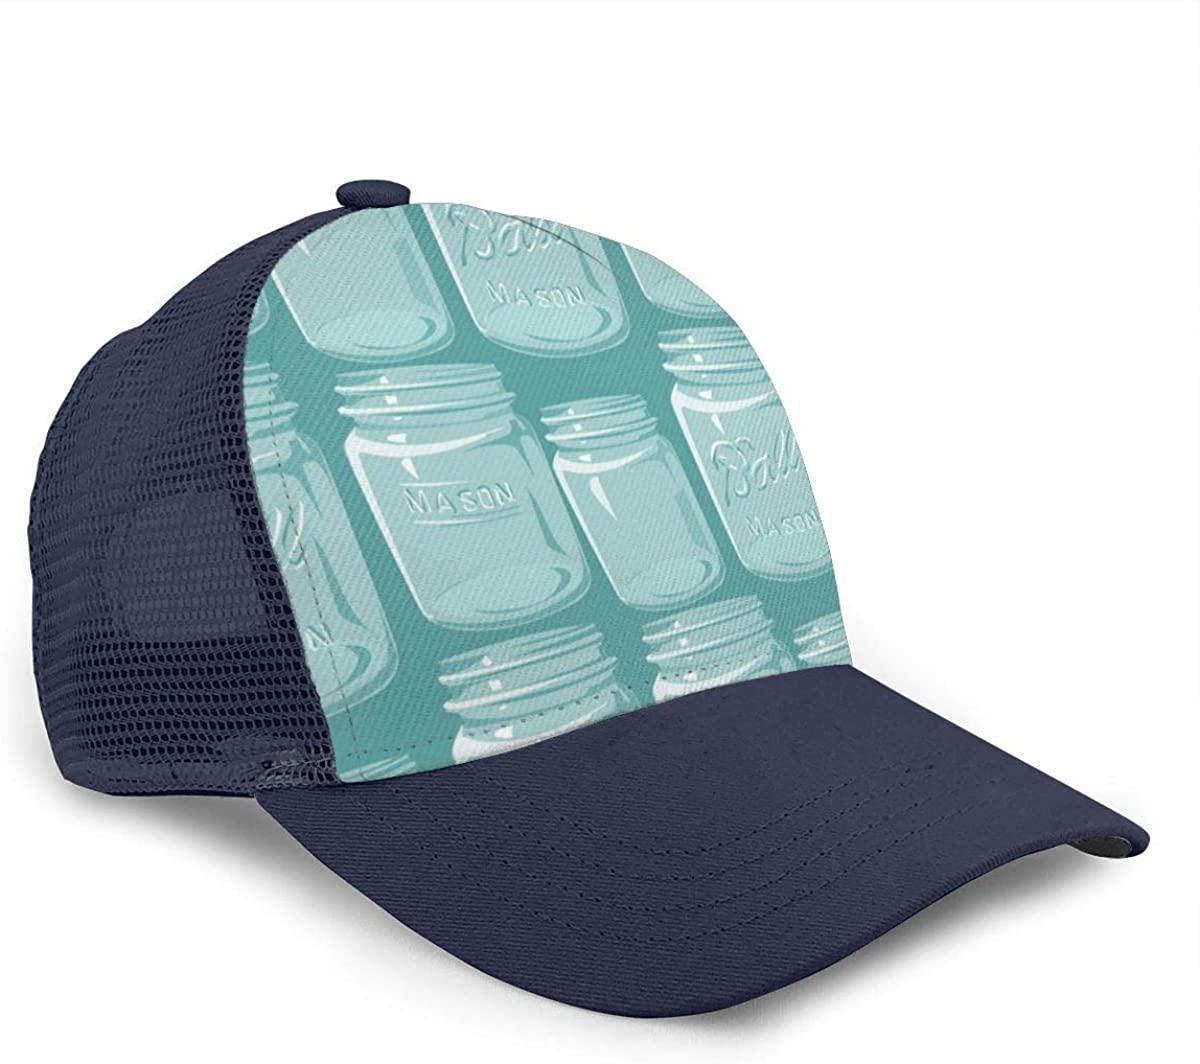 Baseball Cap Men Women - Classic Adjustable Hat - Goat Head Repeat